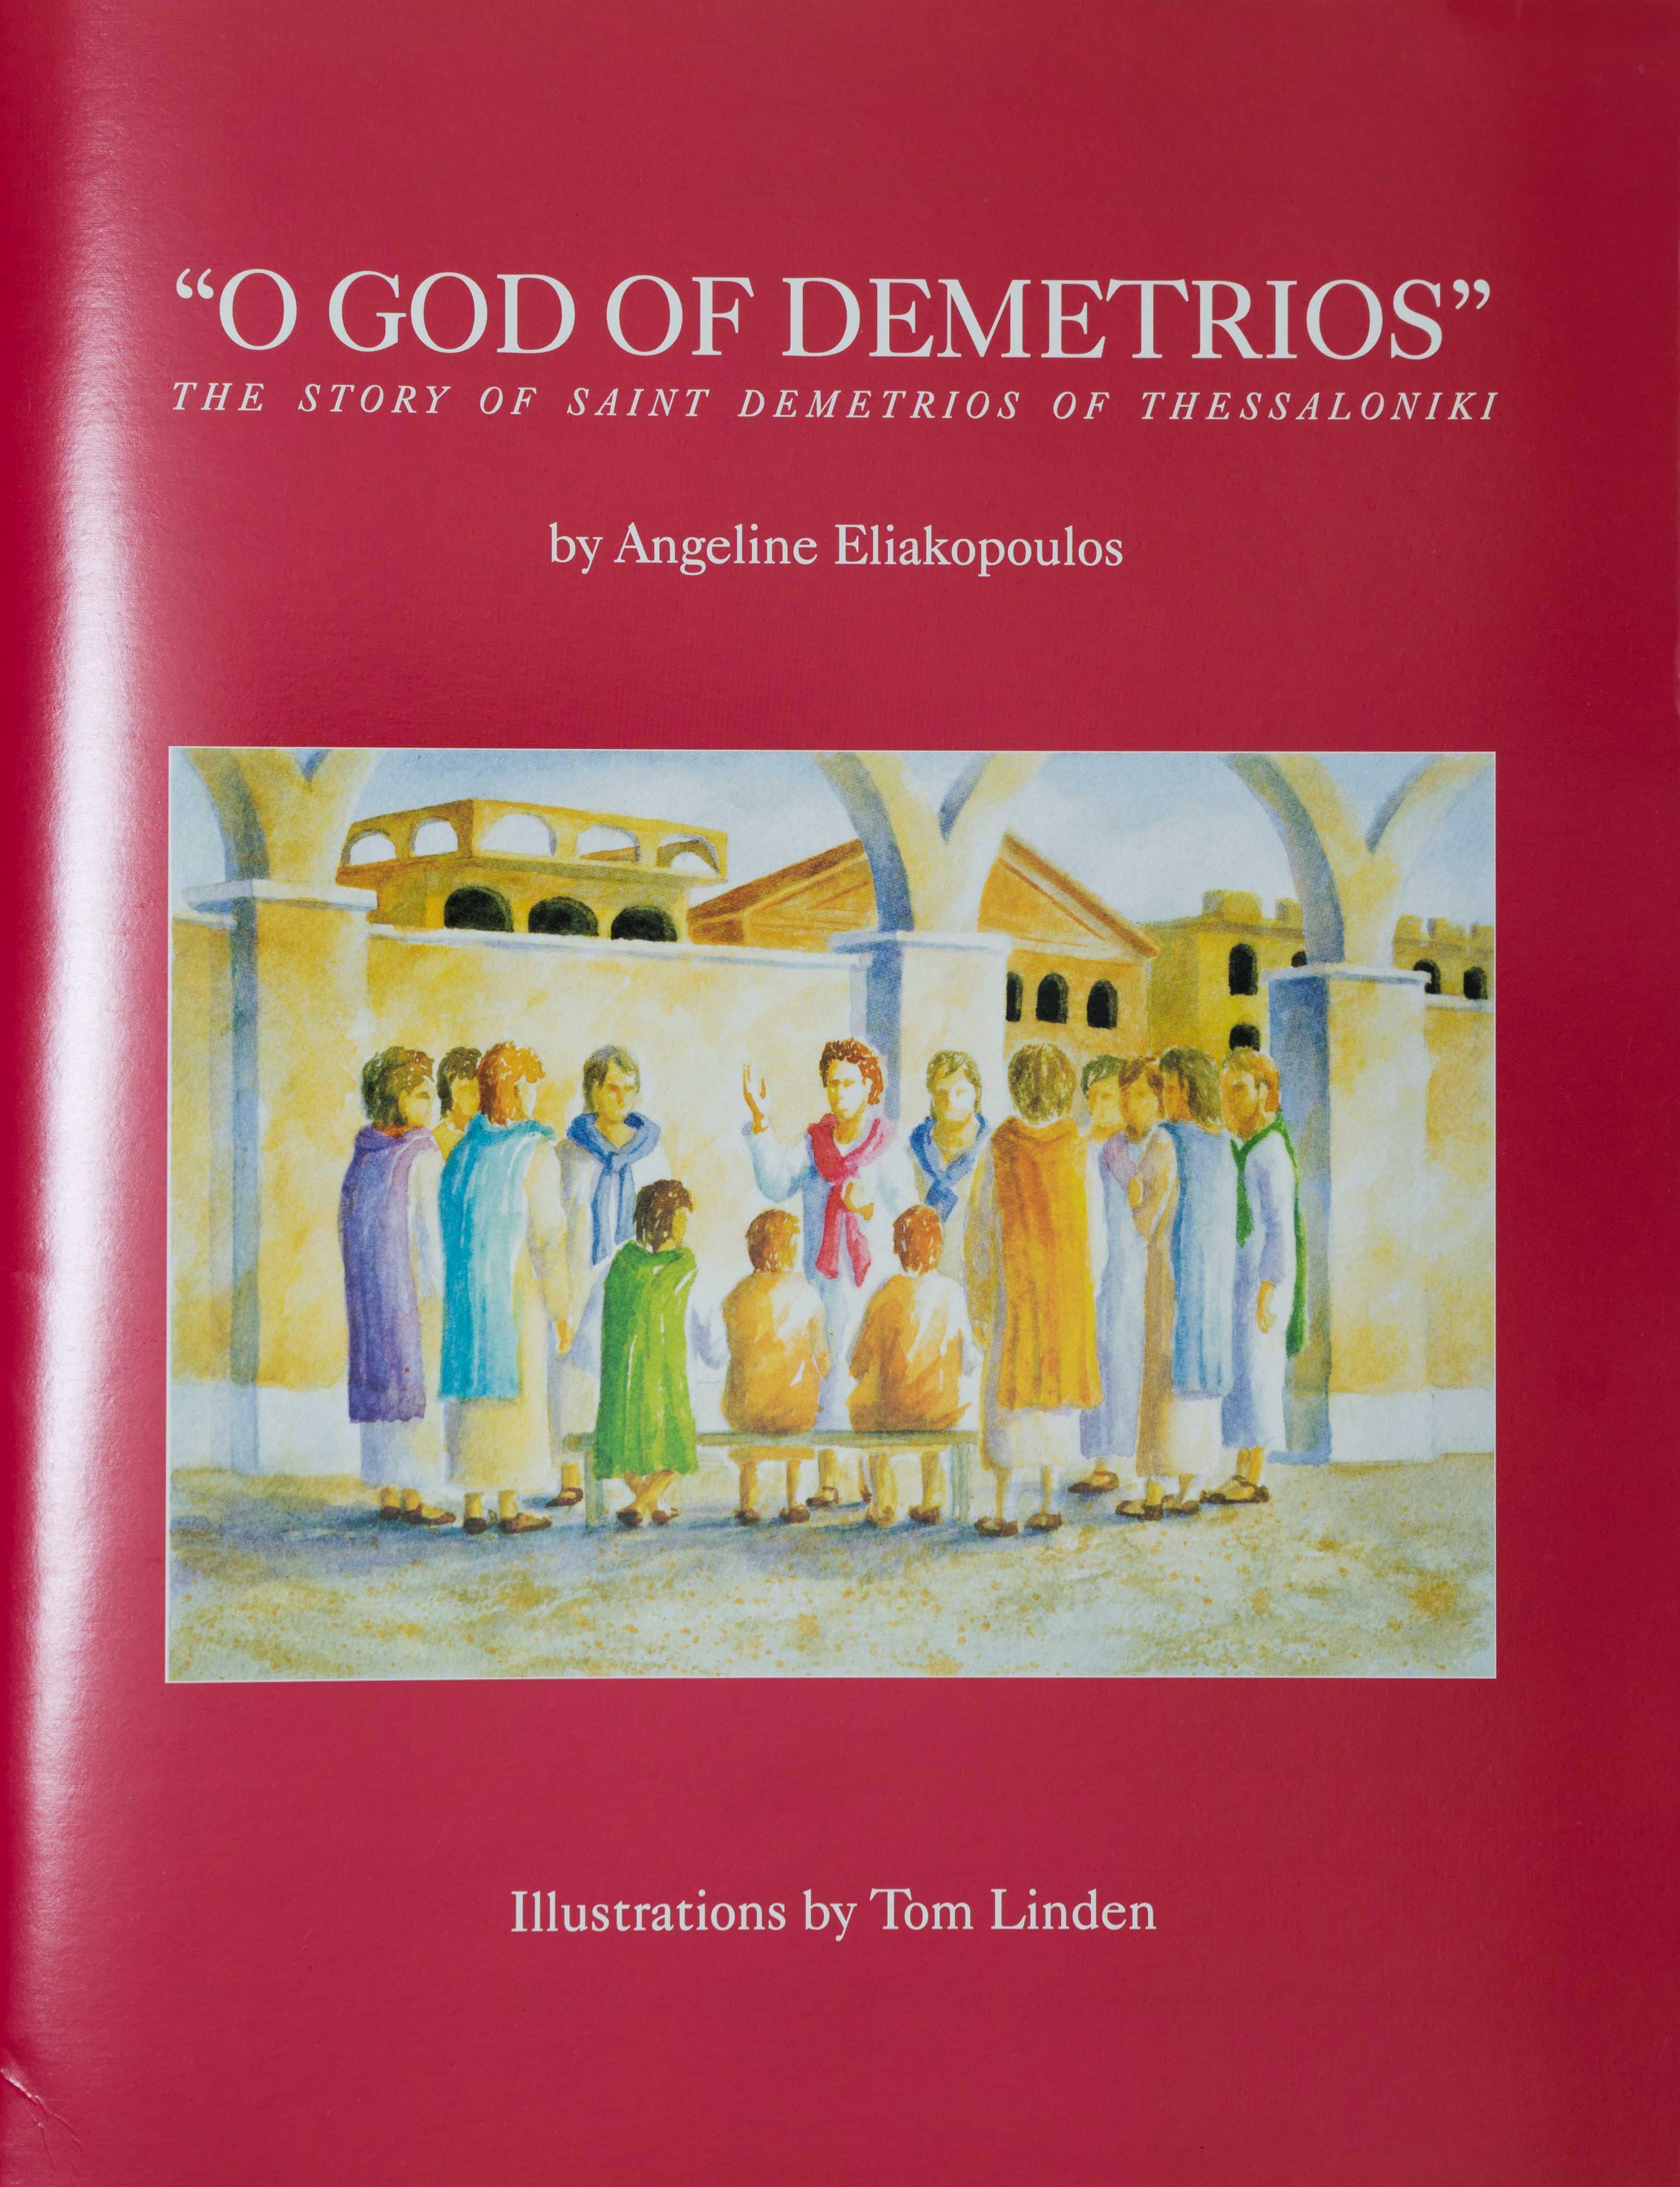 O God of Demetrios: The Story of Saint Demetrios of Thessaloniki